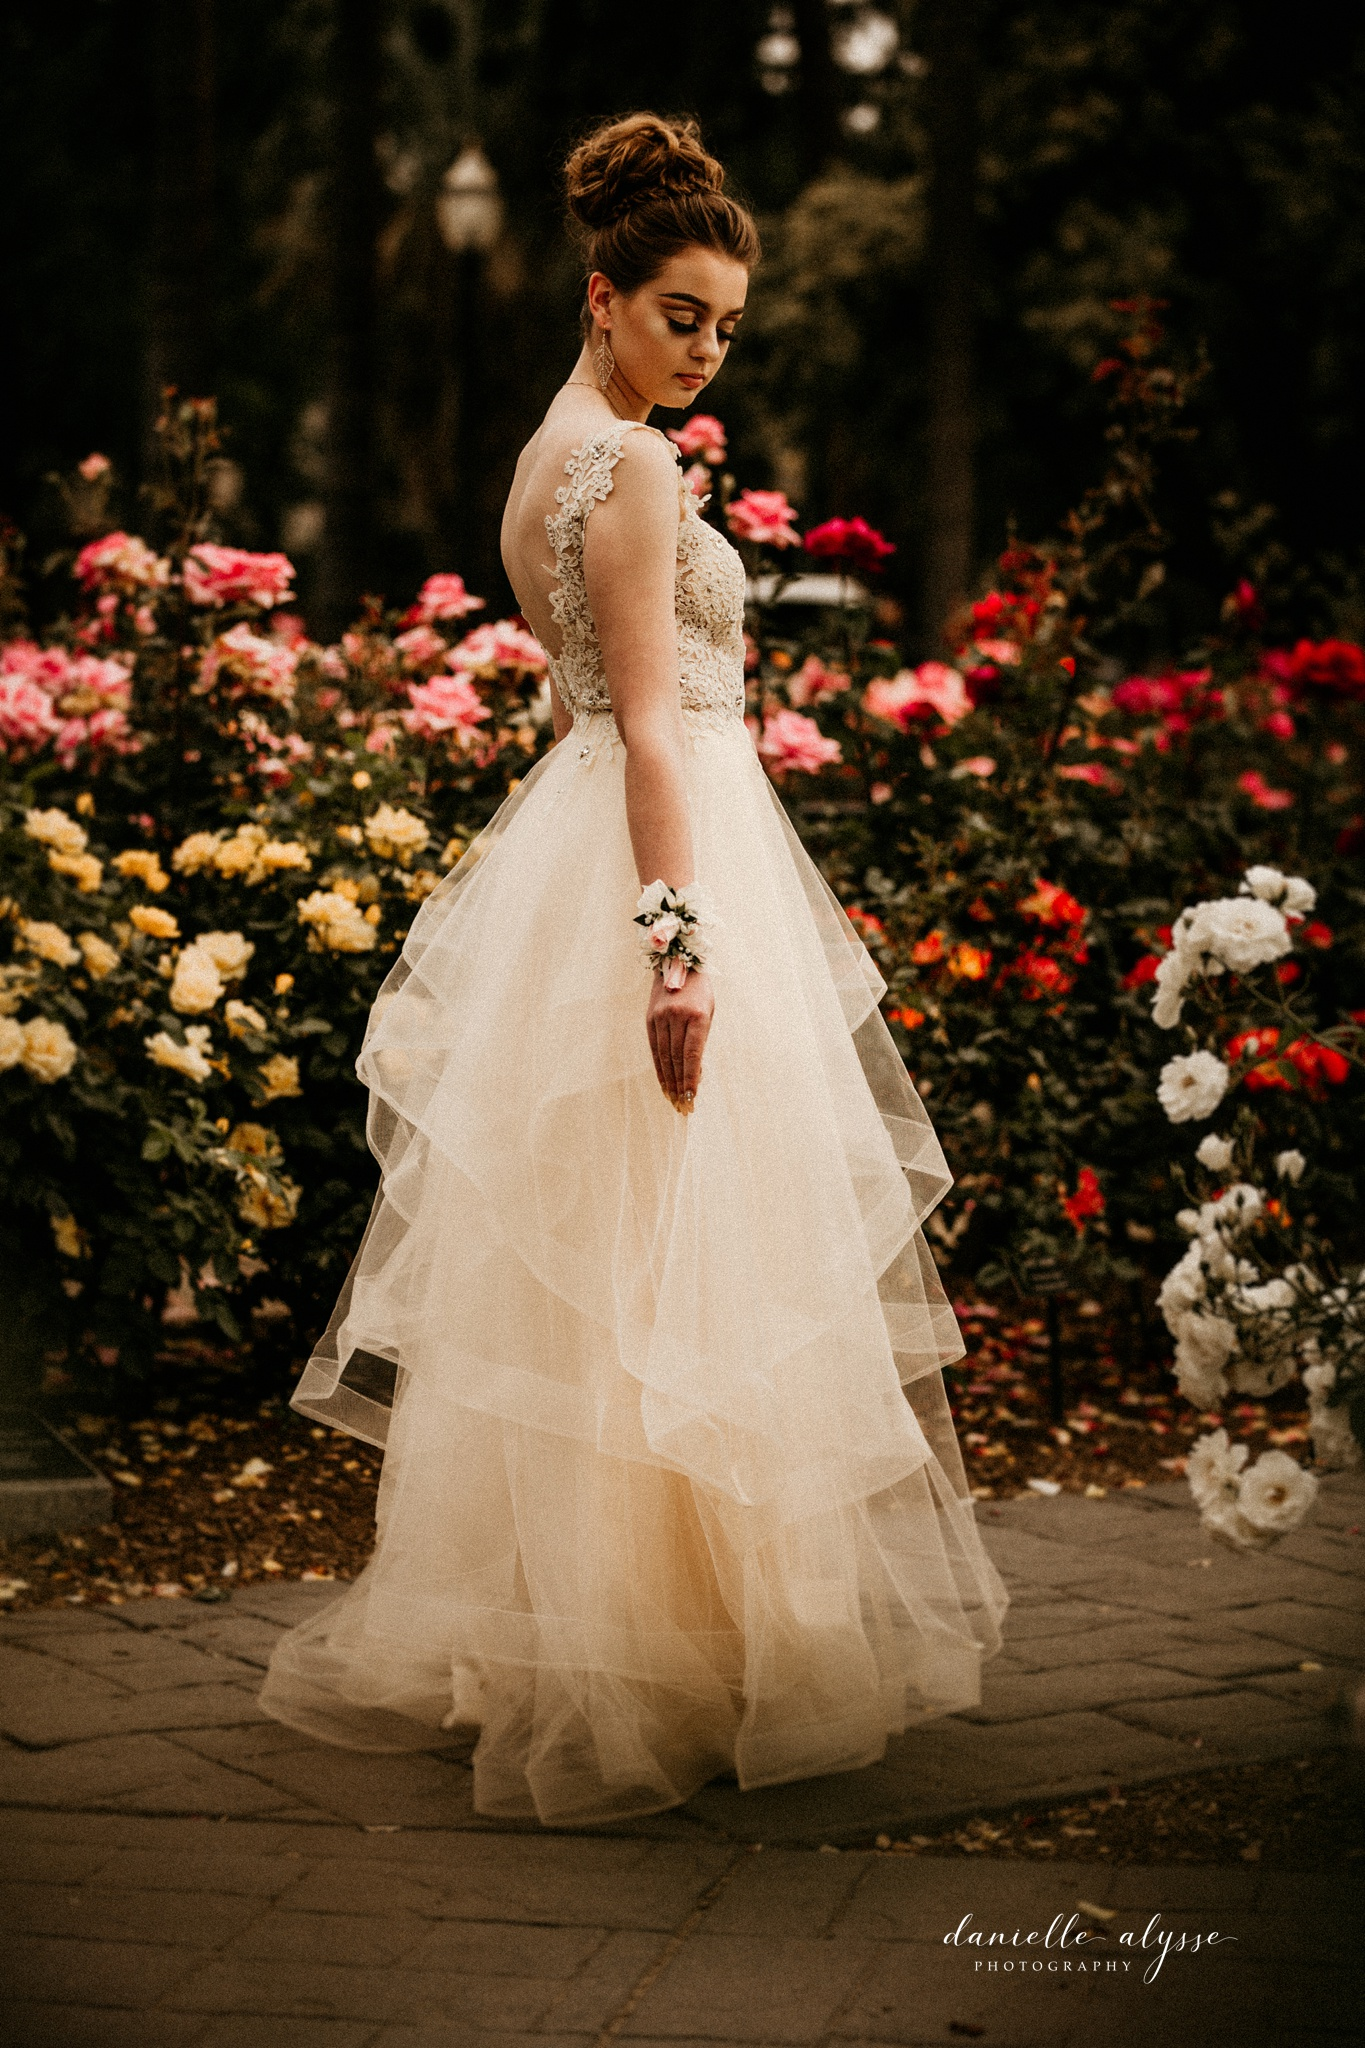 180428_prom_senior_ball_capitol_rose_danielle_alysse_photography_sacramento_photographer_blog_35_WEB.jpg